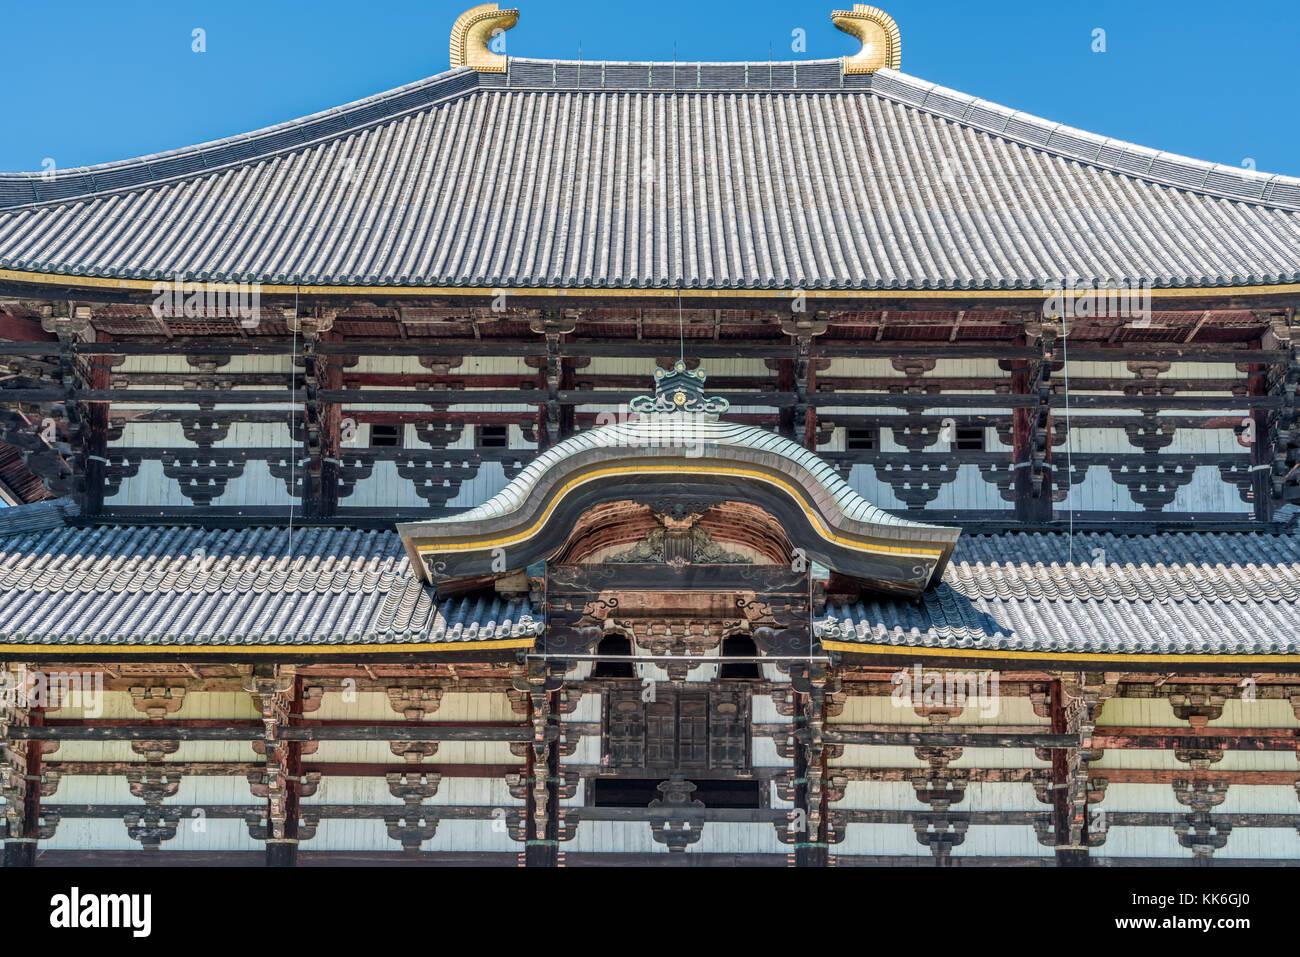 Daibutsuden (Great Buddha Hall) of Todai-ji (Eastern Great Temple) in Nara, Japan. Headquarters of the Kegon school - Stock Image